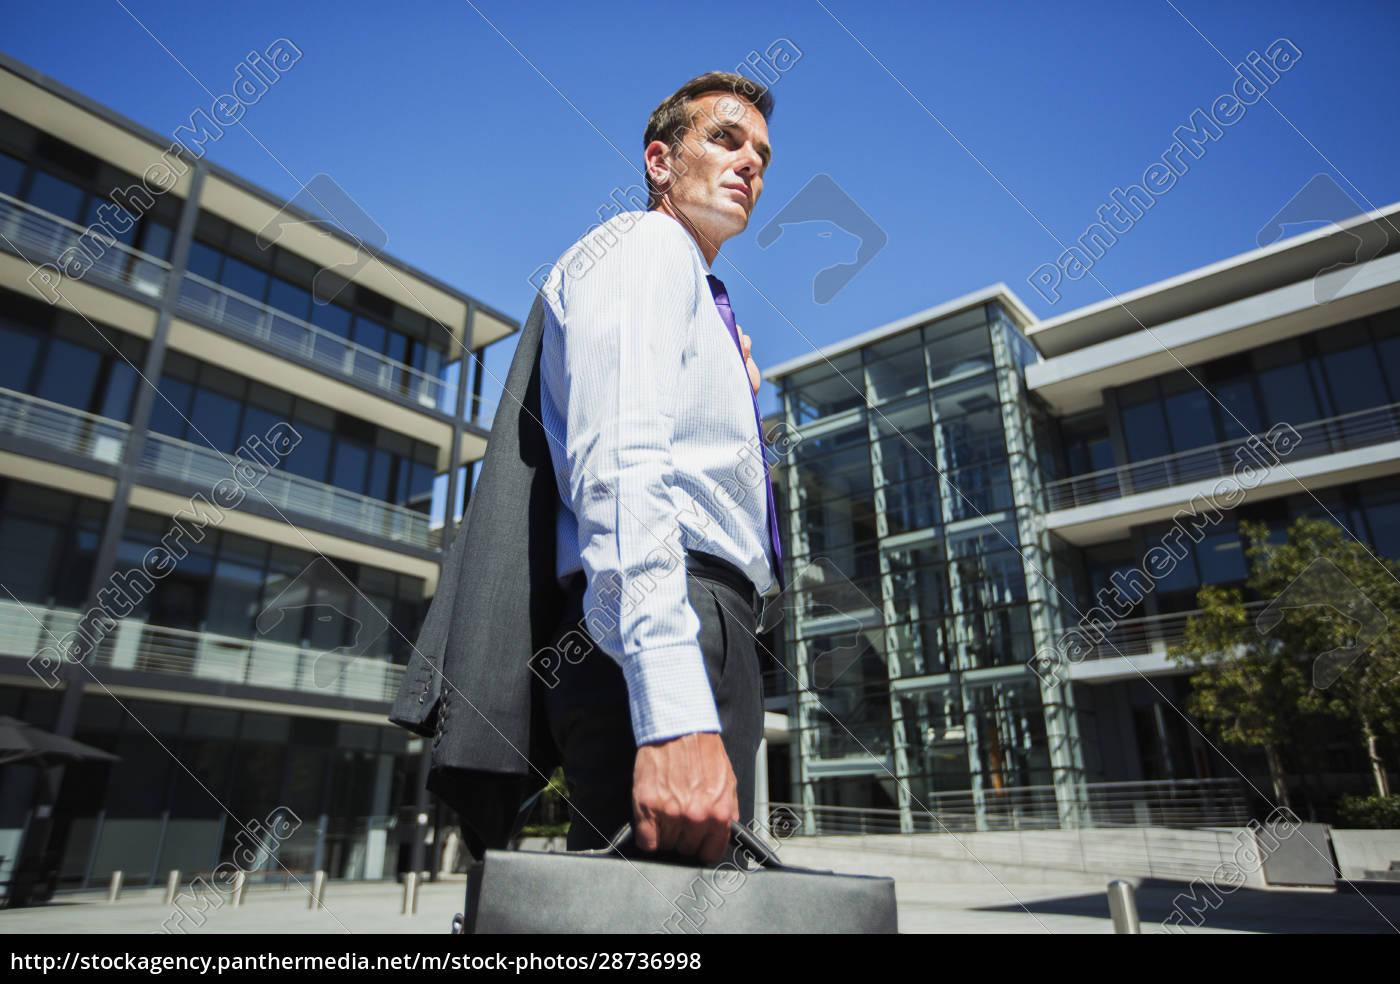 businessman, outside, building - 28736998